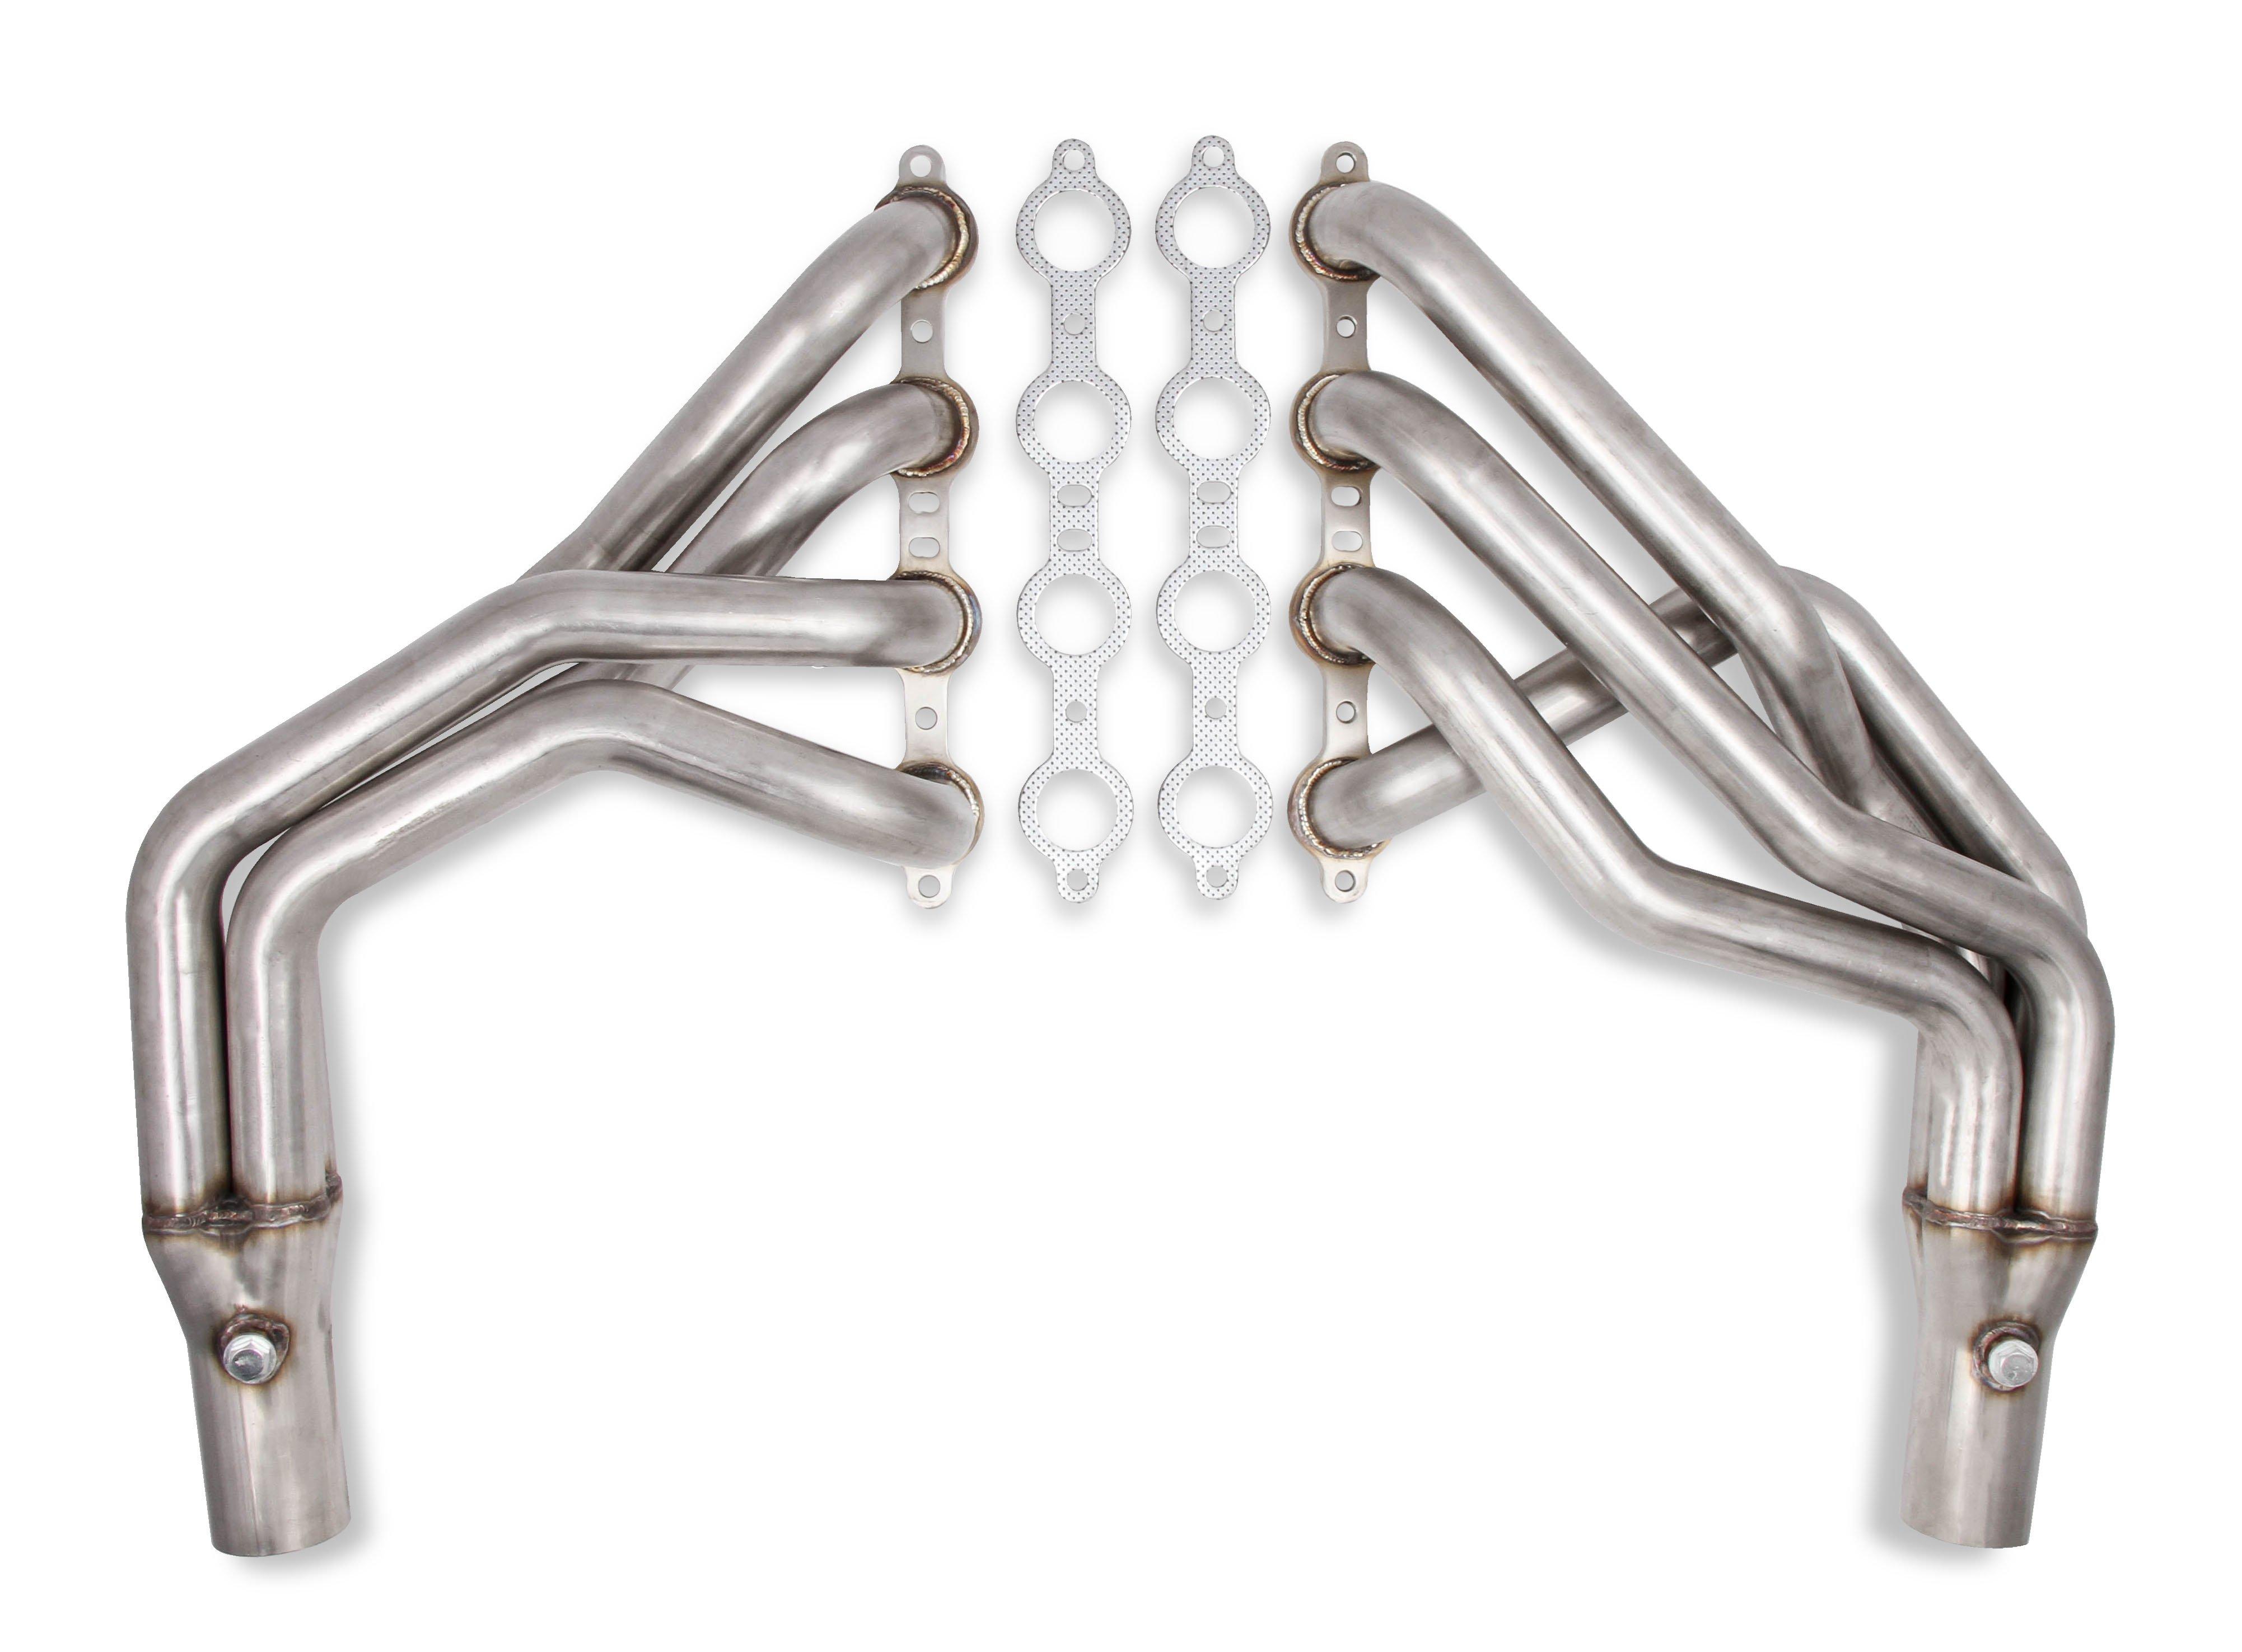 Flowtech Long Tube LS Swap Headers - Natural